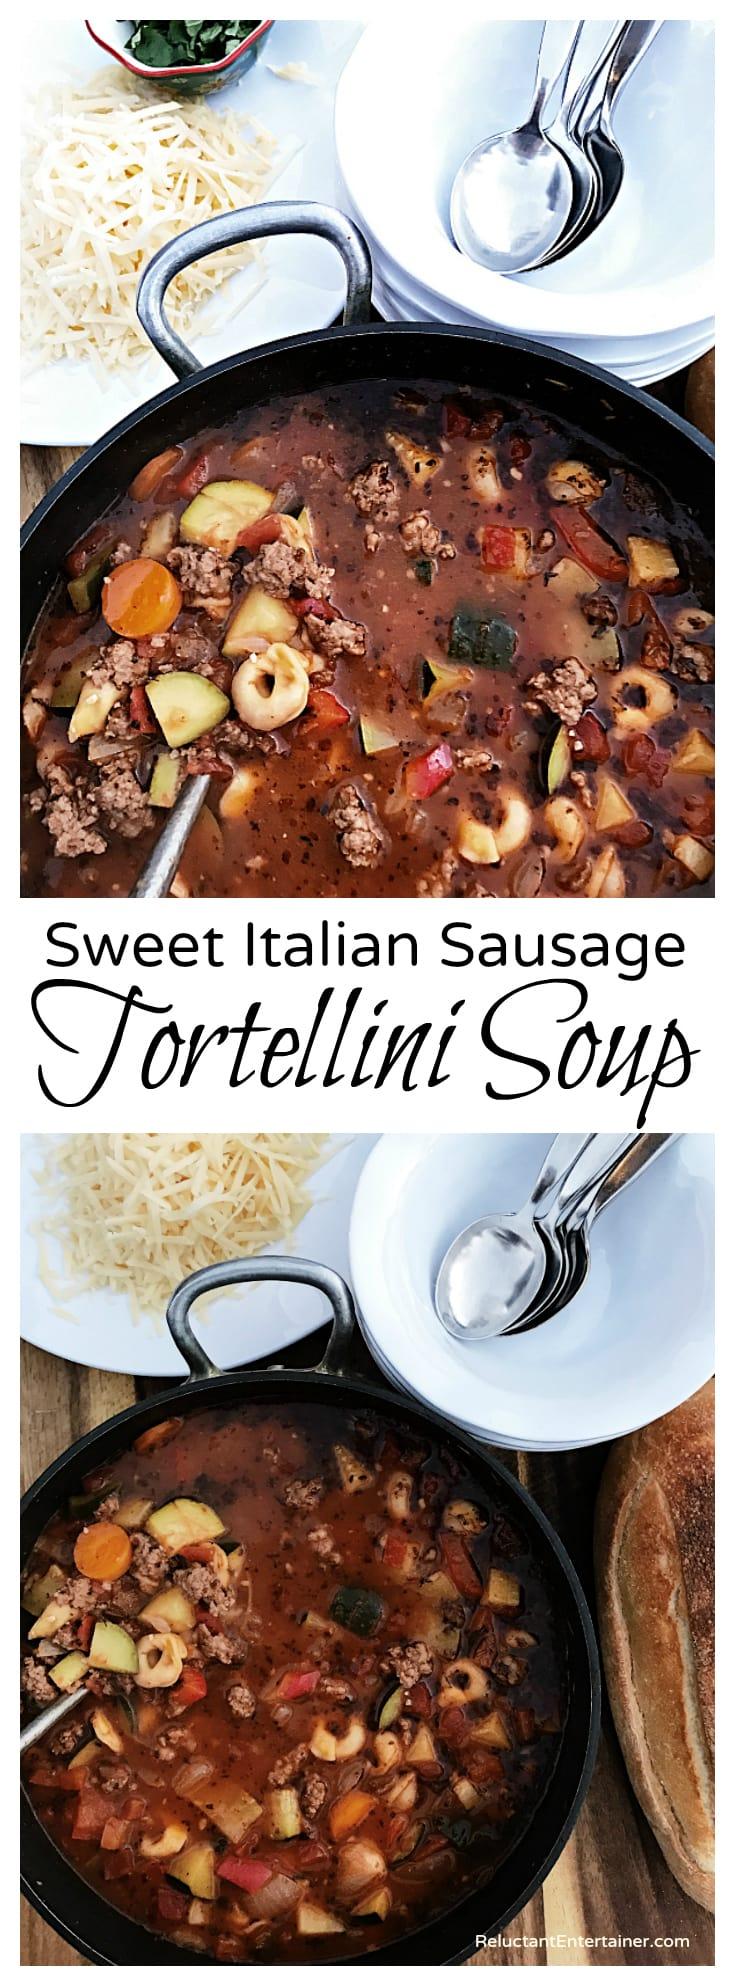 Sweet Italian Sausage Tortellini Soup Recipe